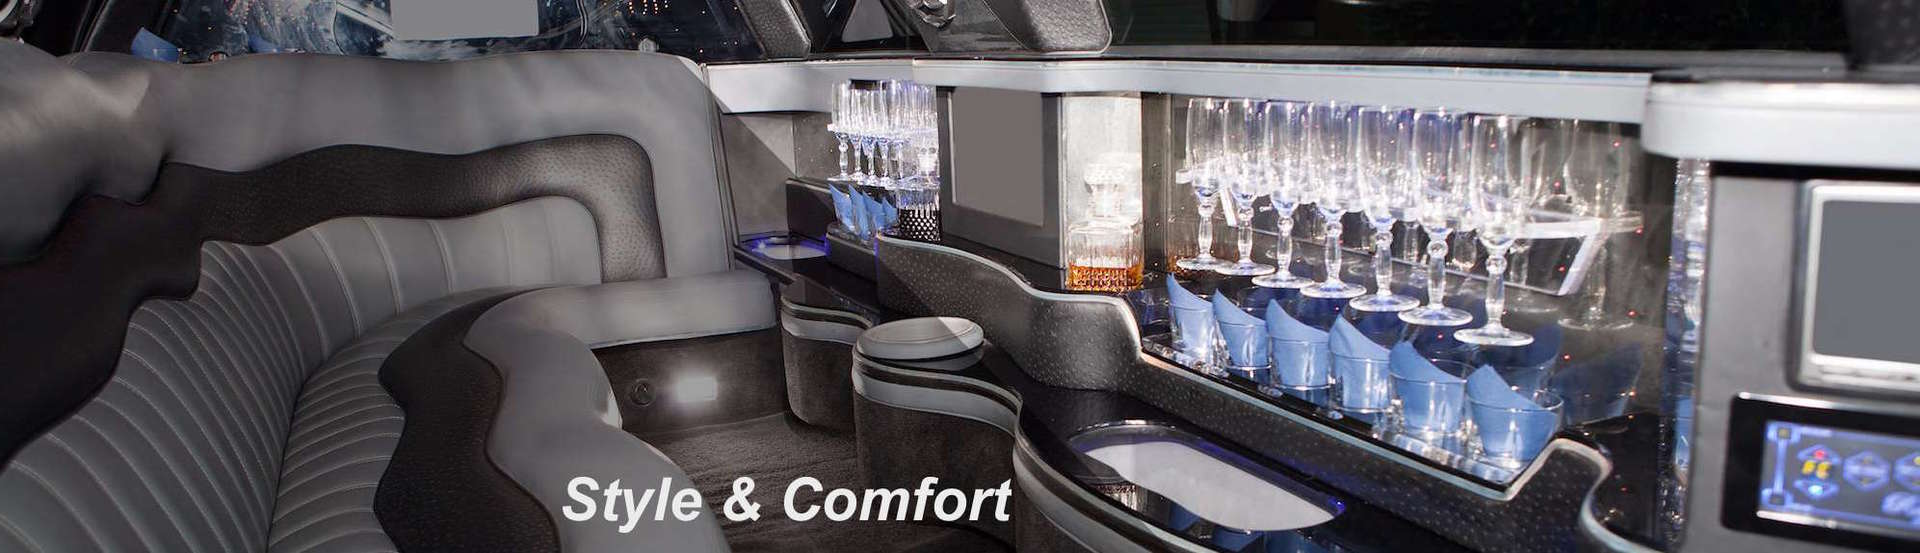 limo rental service